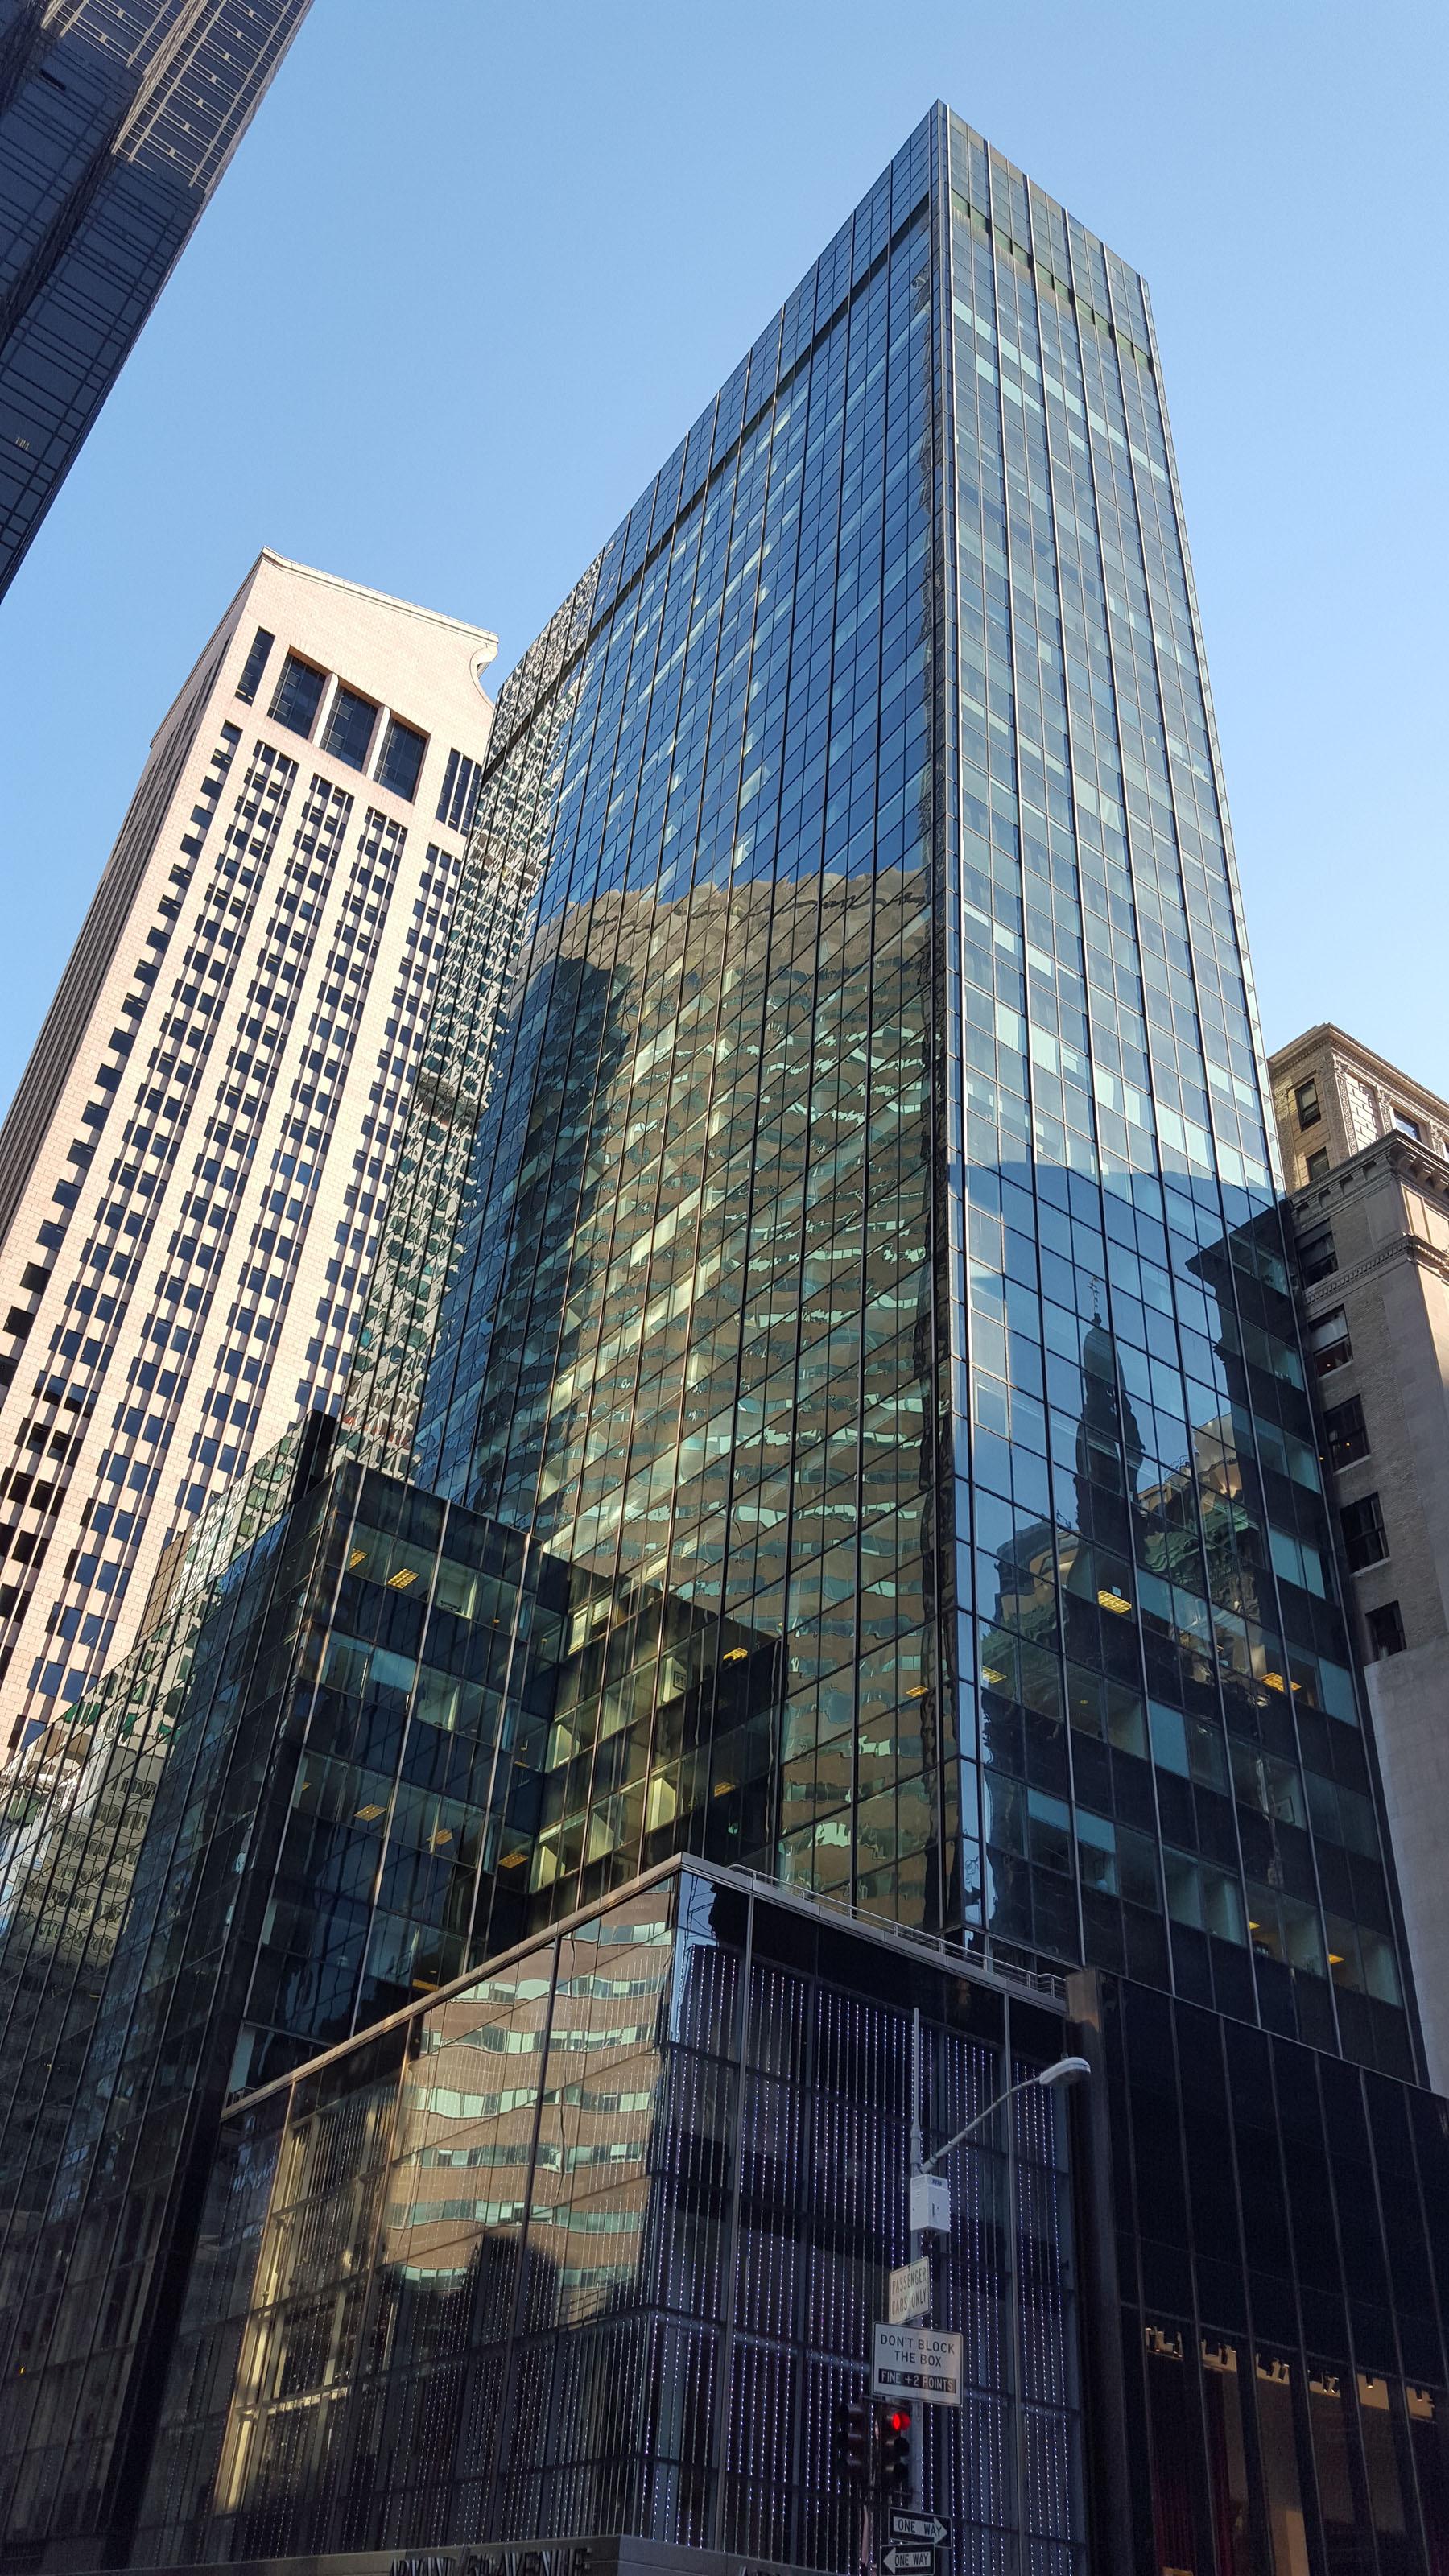 717 Fifth Avenue